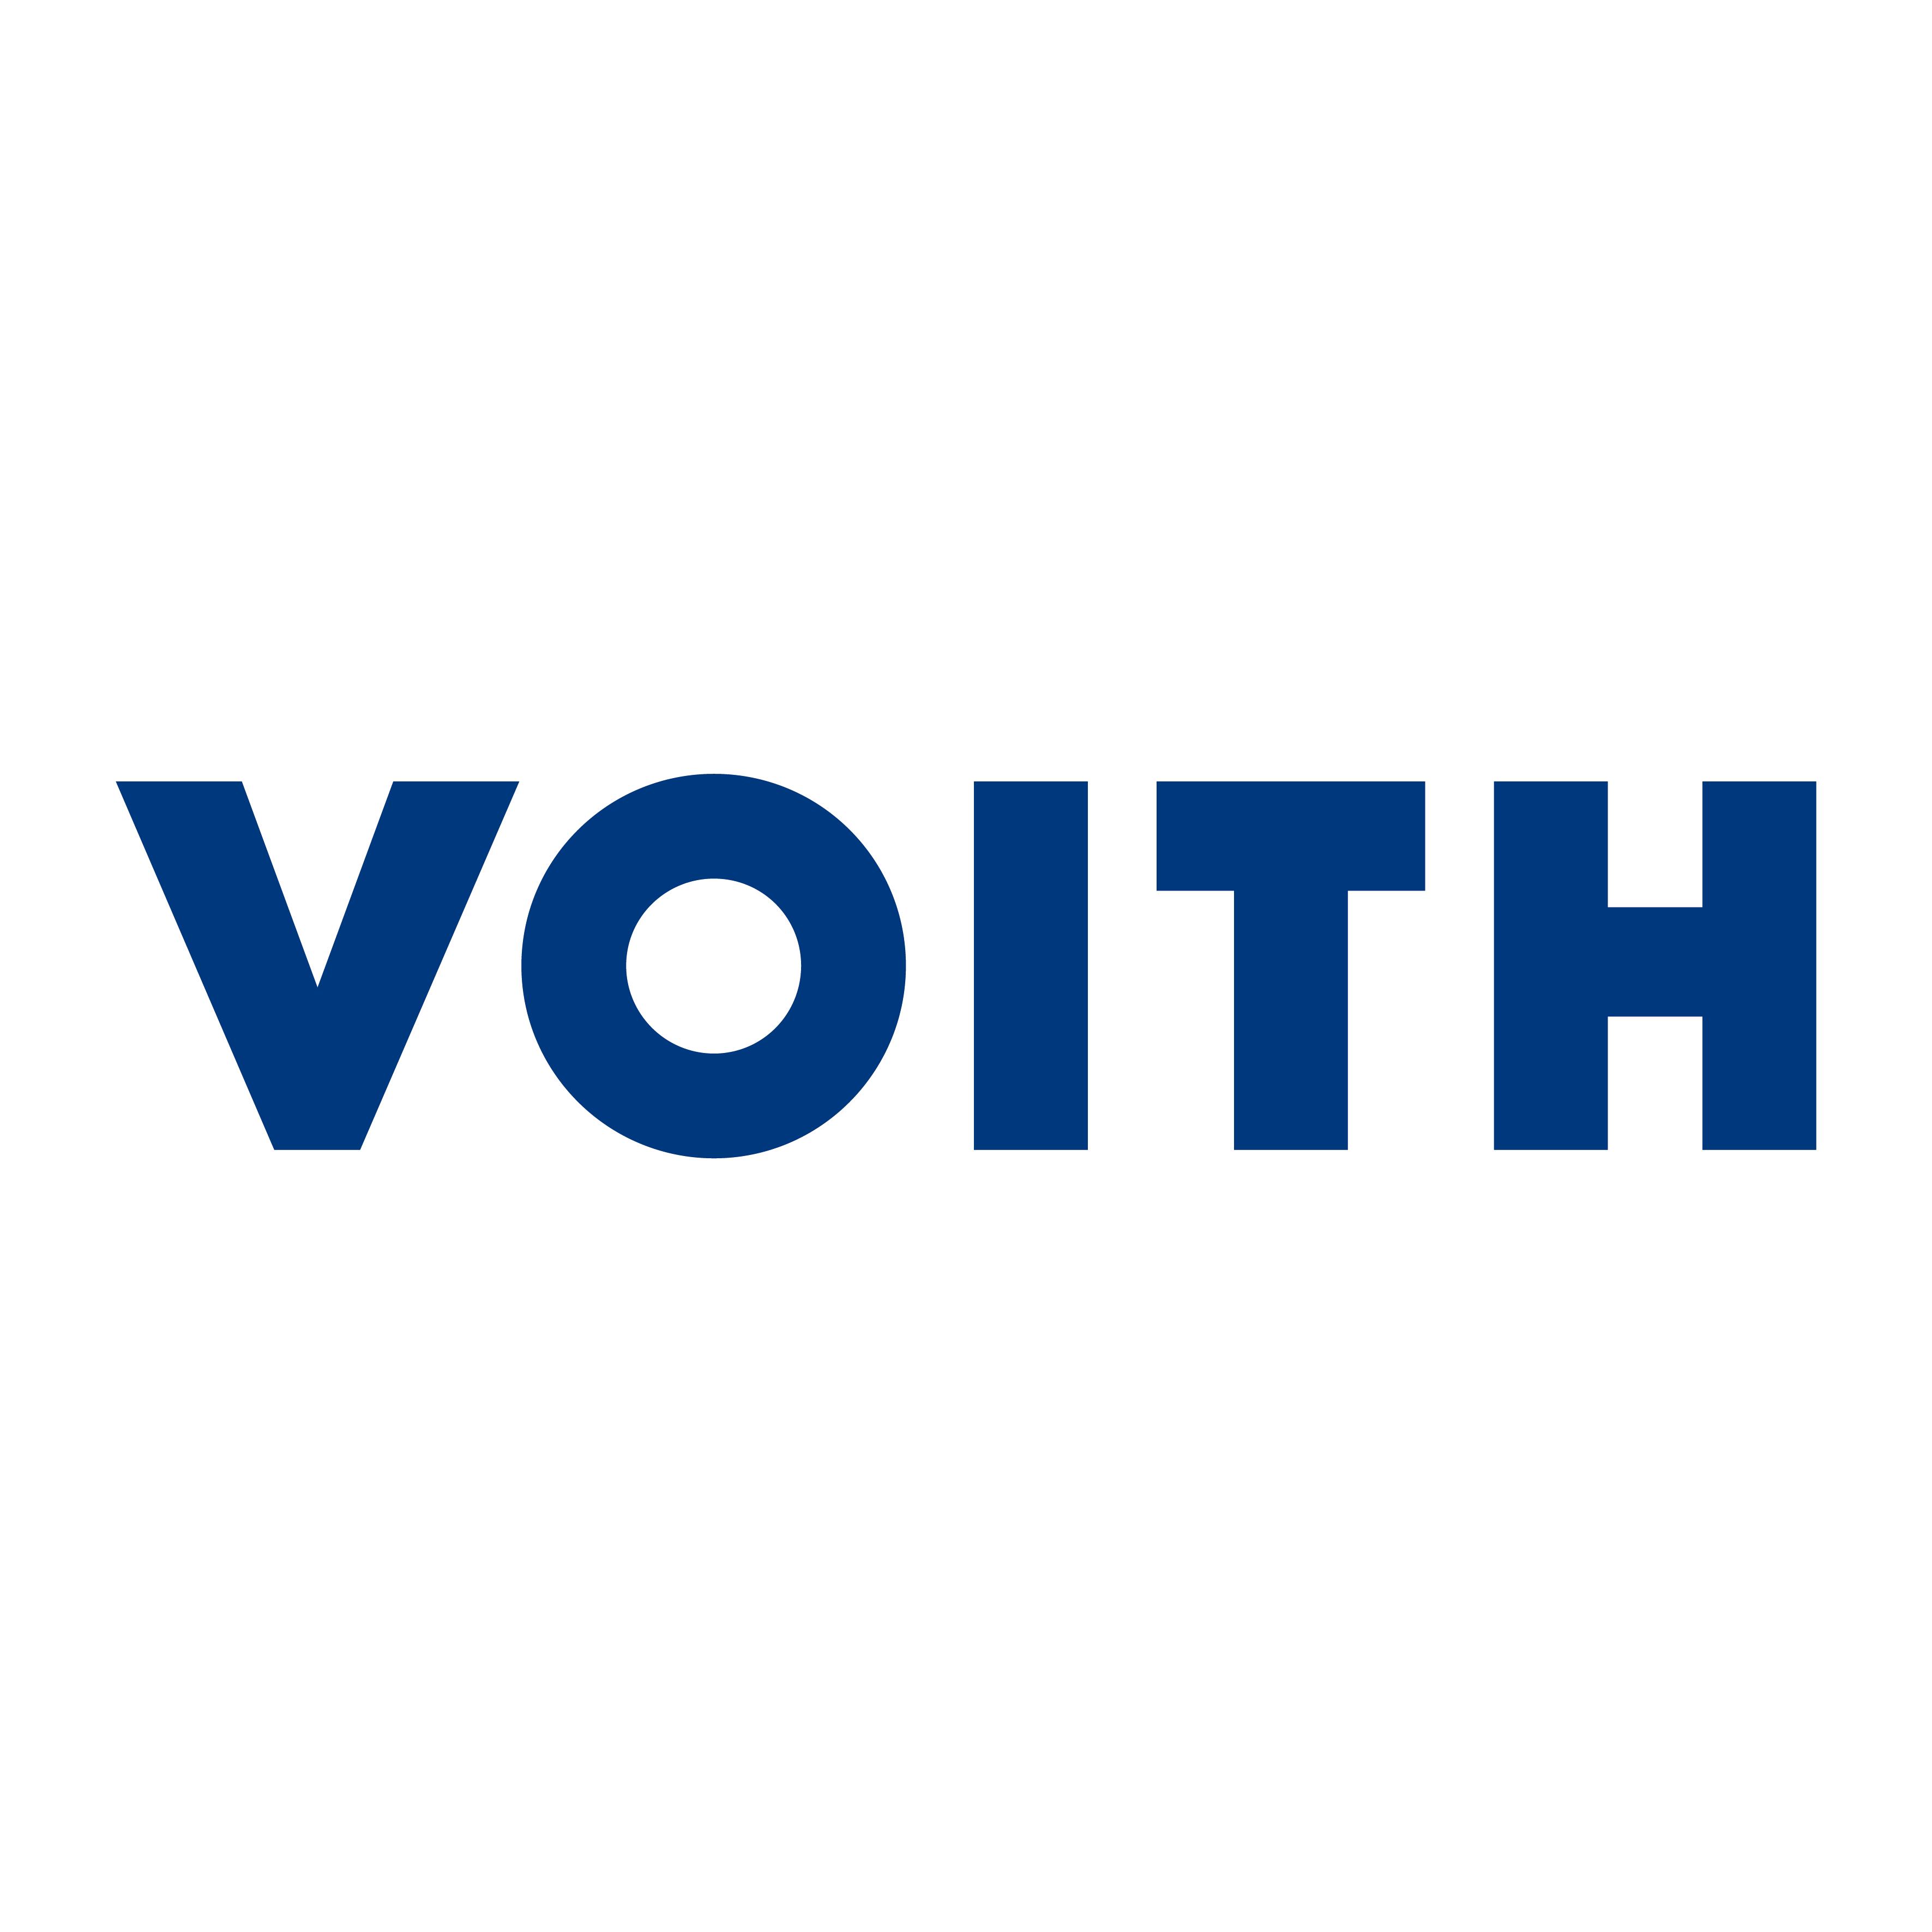 Voith logo方